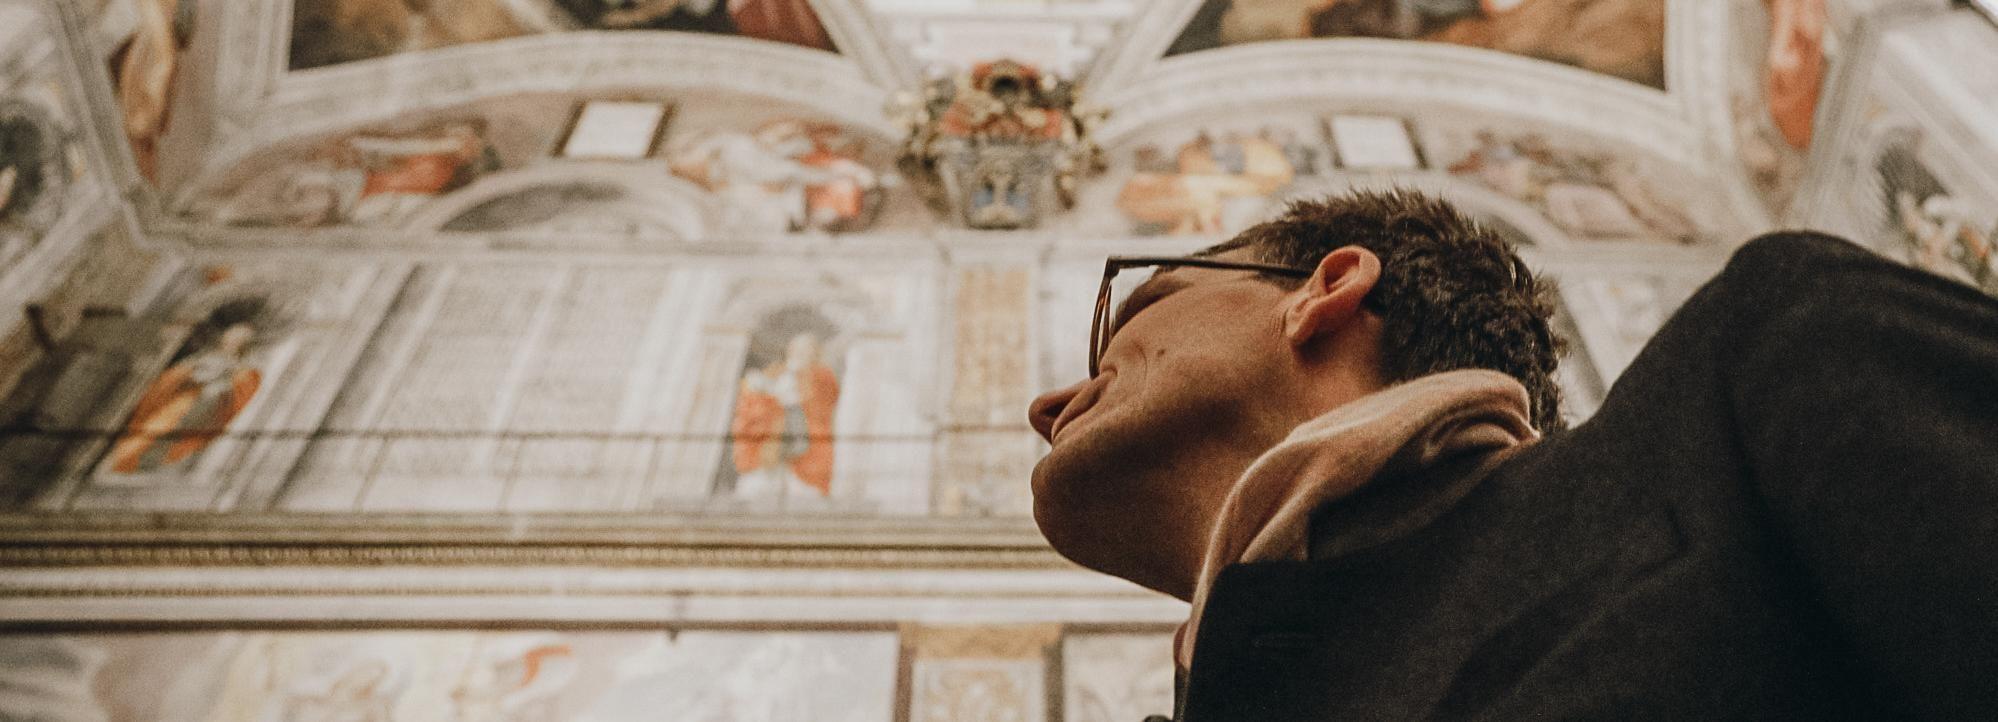 Rome: Sistine Chapel & Michelangelo Virtual Tour with Guide